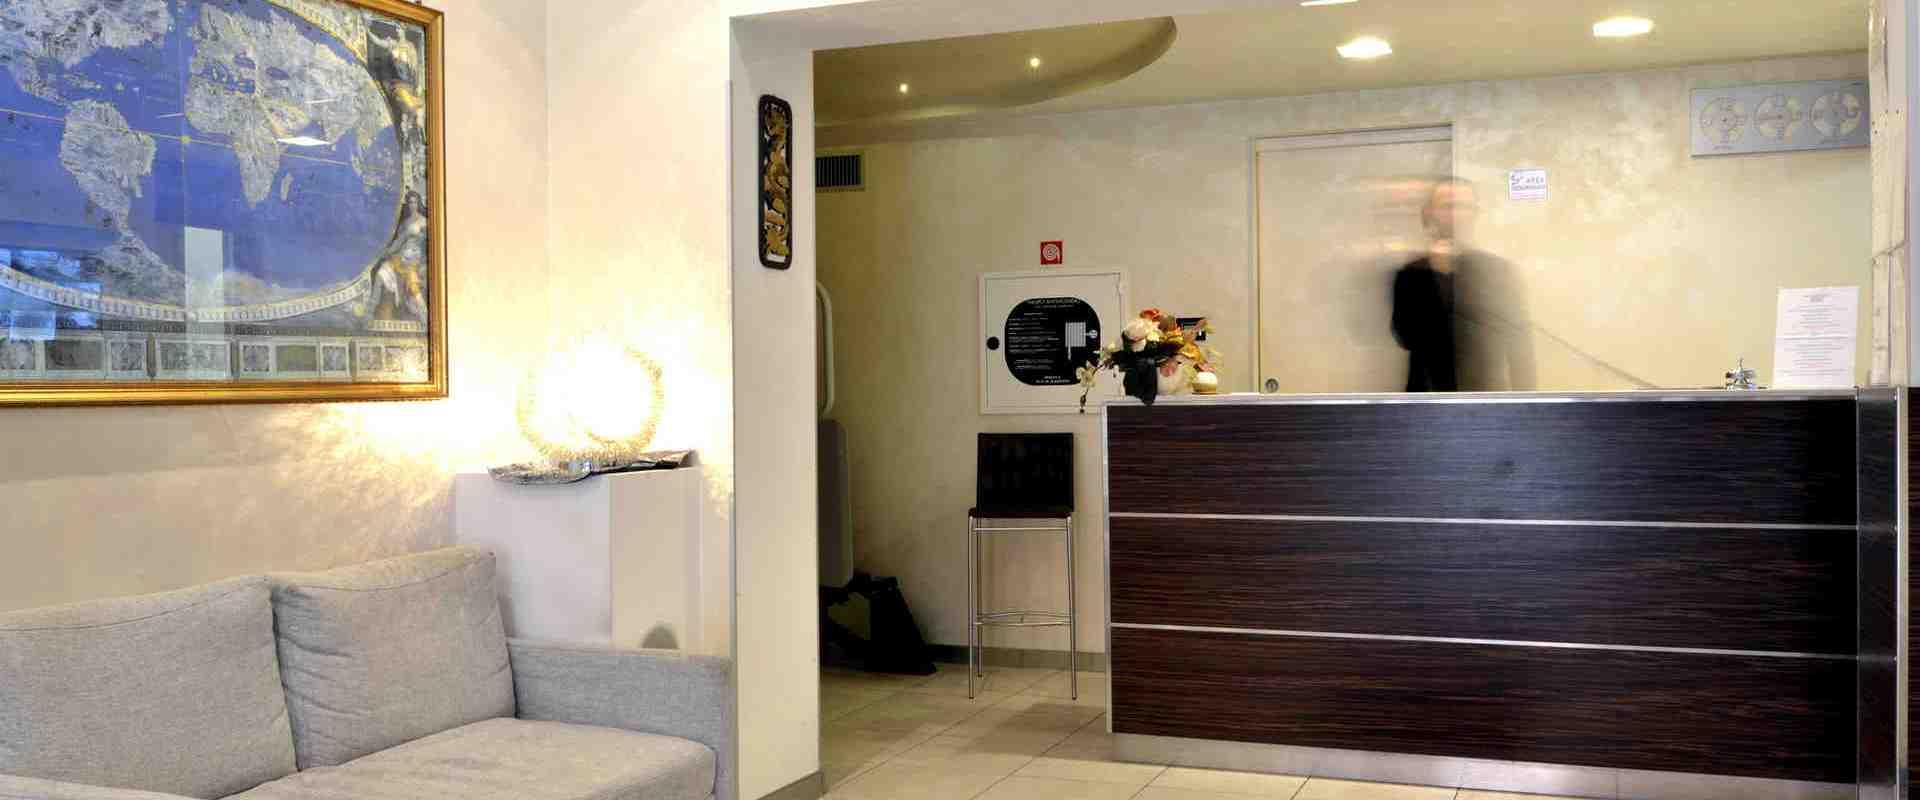 Hotel Alla Bianca Near Venice